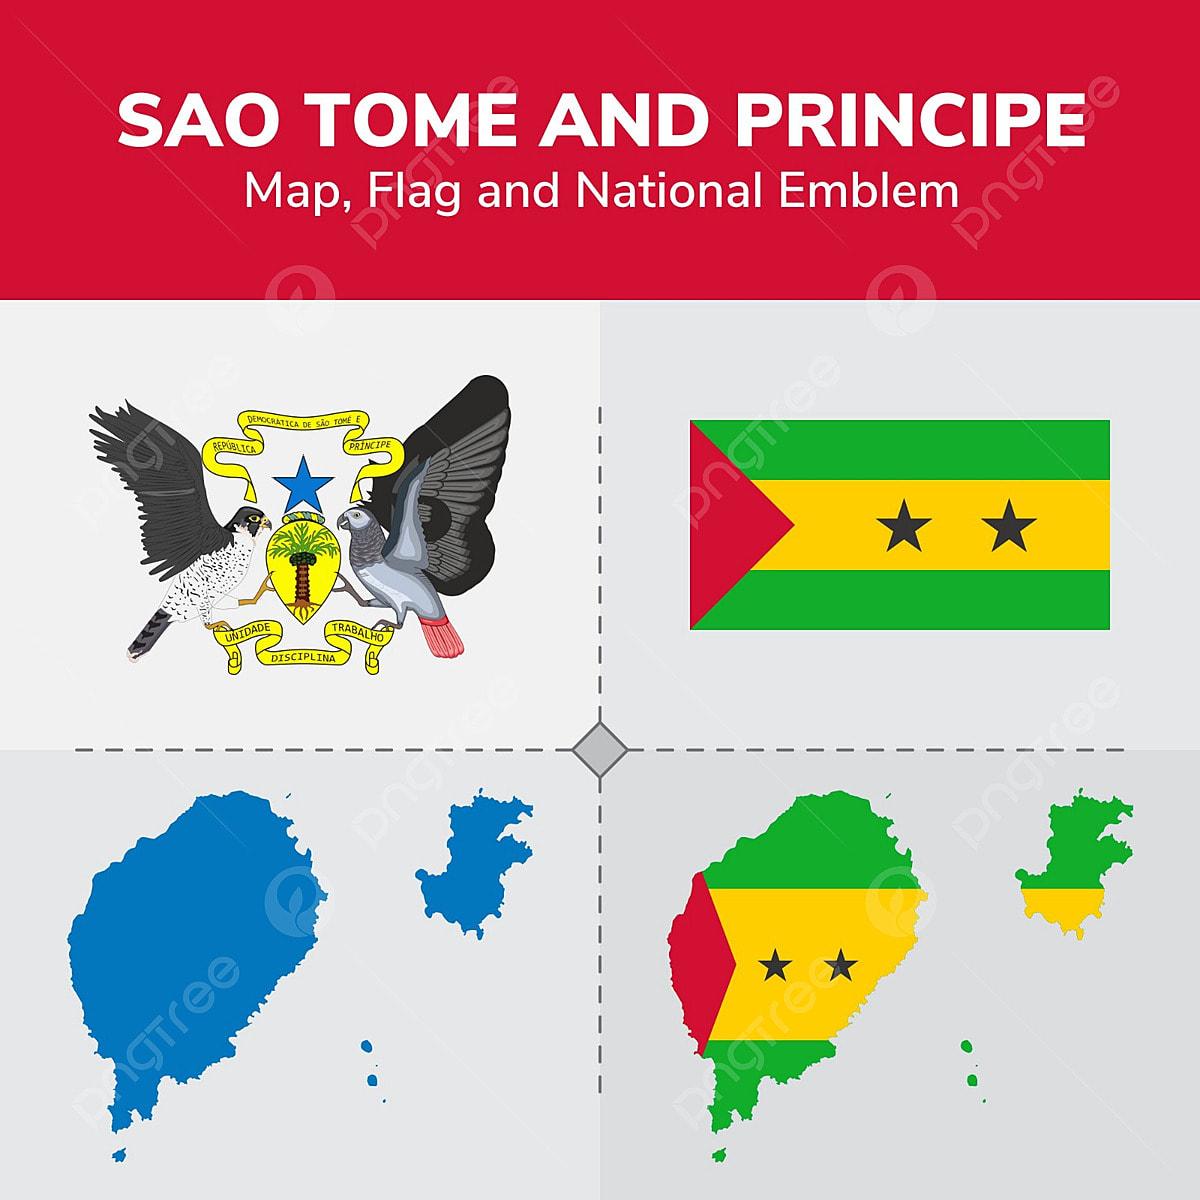 Sao Tome And Principe Map Flag And National Emblem ... Sao Tome E Principe Map on seychelles map, saudi arabia map, comoros map, bangladesh map, central african republic map, new britain island map, lesotho map, united arab emirates map, tanzania map, trinidad & tobago map, honshu island map, principe island map, hong kong map, eritrea map, tokelau map, u.a.e. map, sri lanka map, tunisia map, niue map,